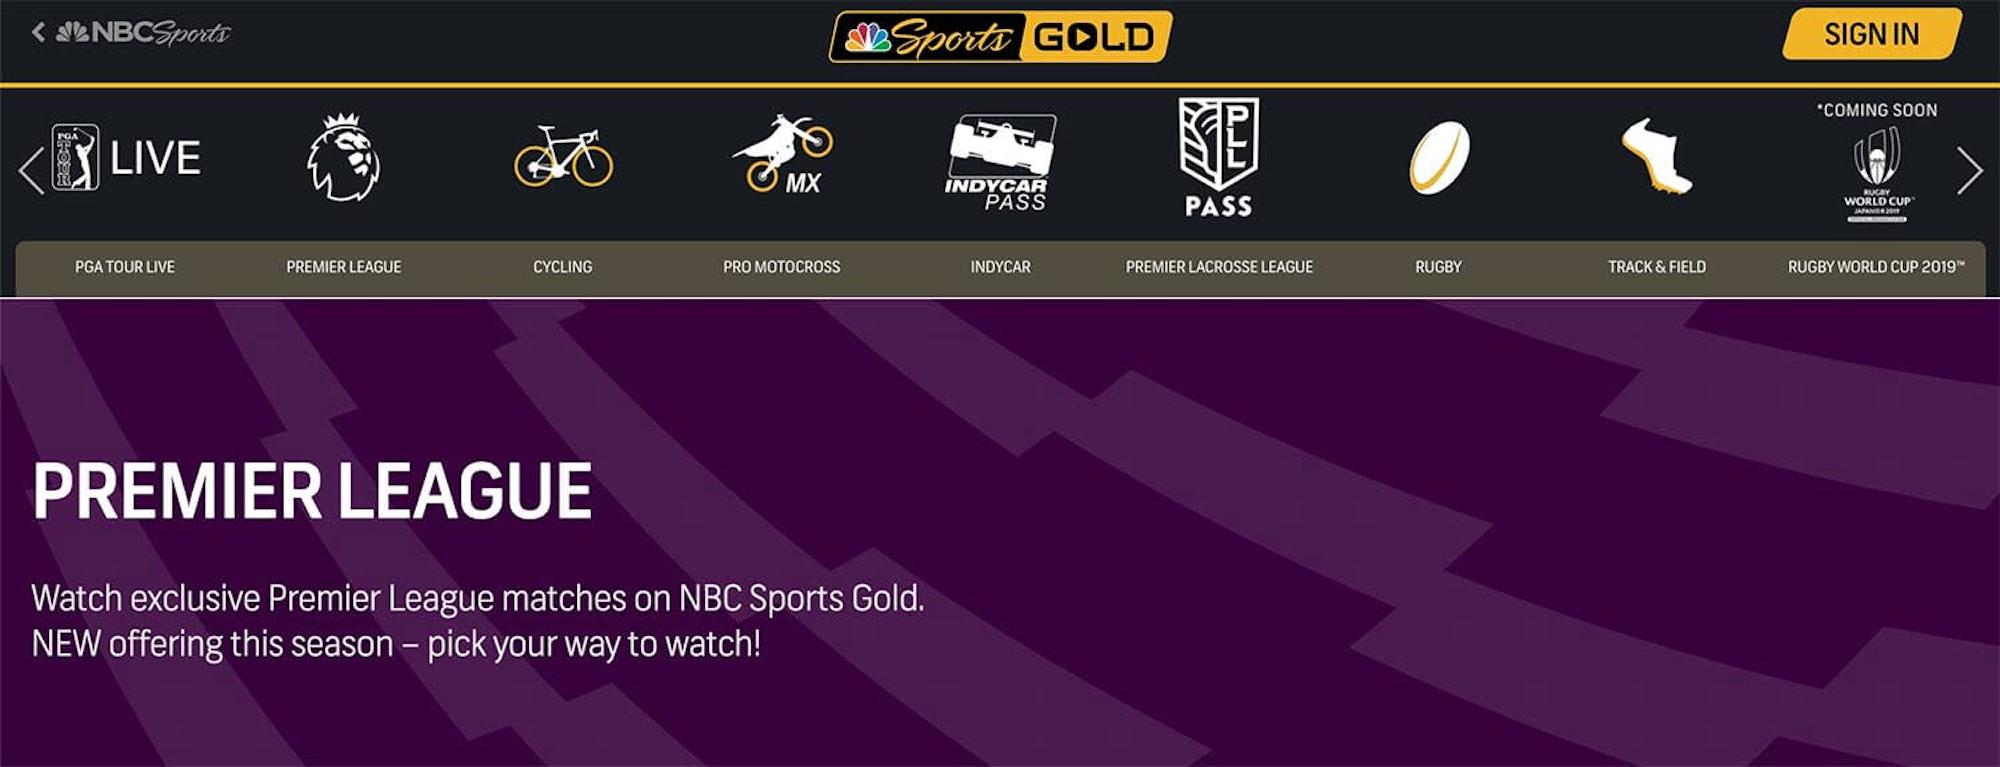 2019-20 premier league liverpool vs leicester city soccer live stream free nbc sports gold